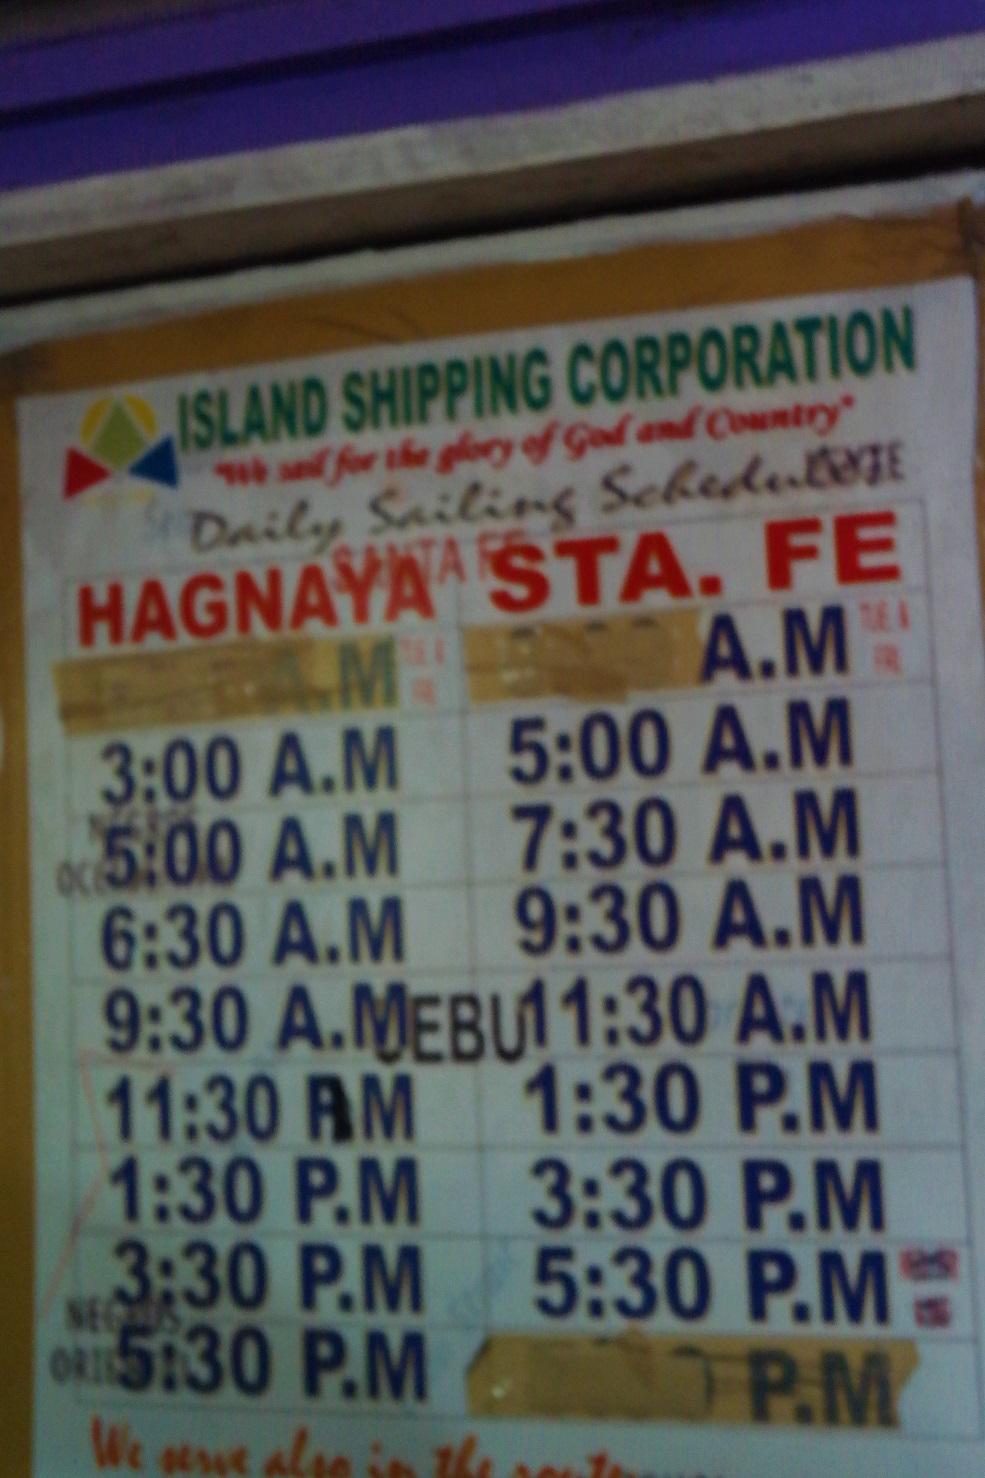 Hagnaya Port Schedule